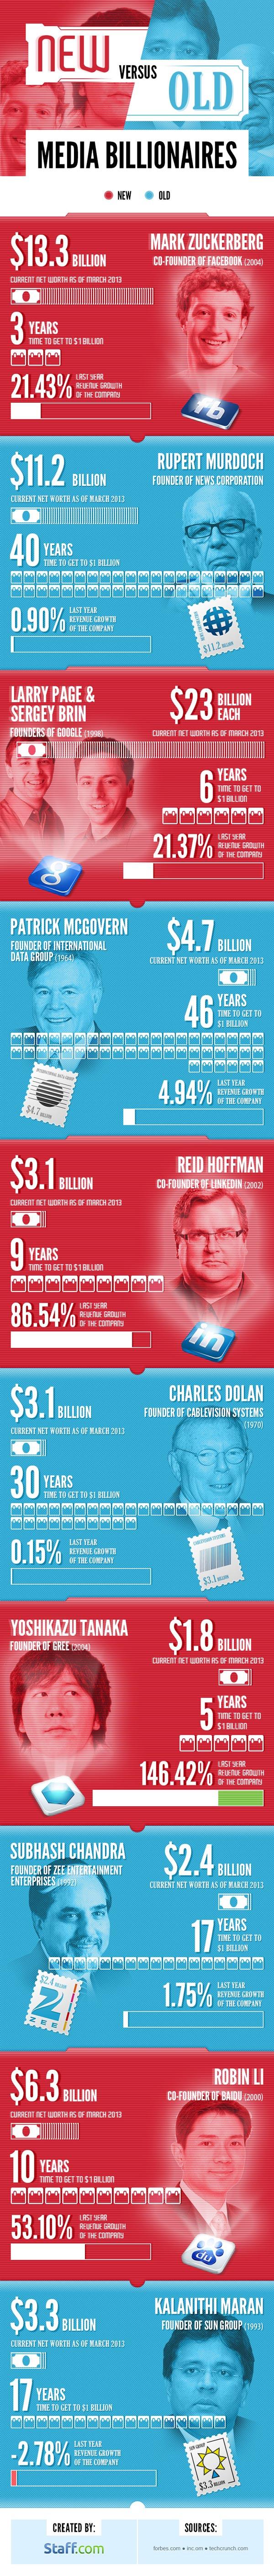 Media Billionaires Comparison-Infographic